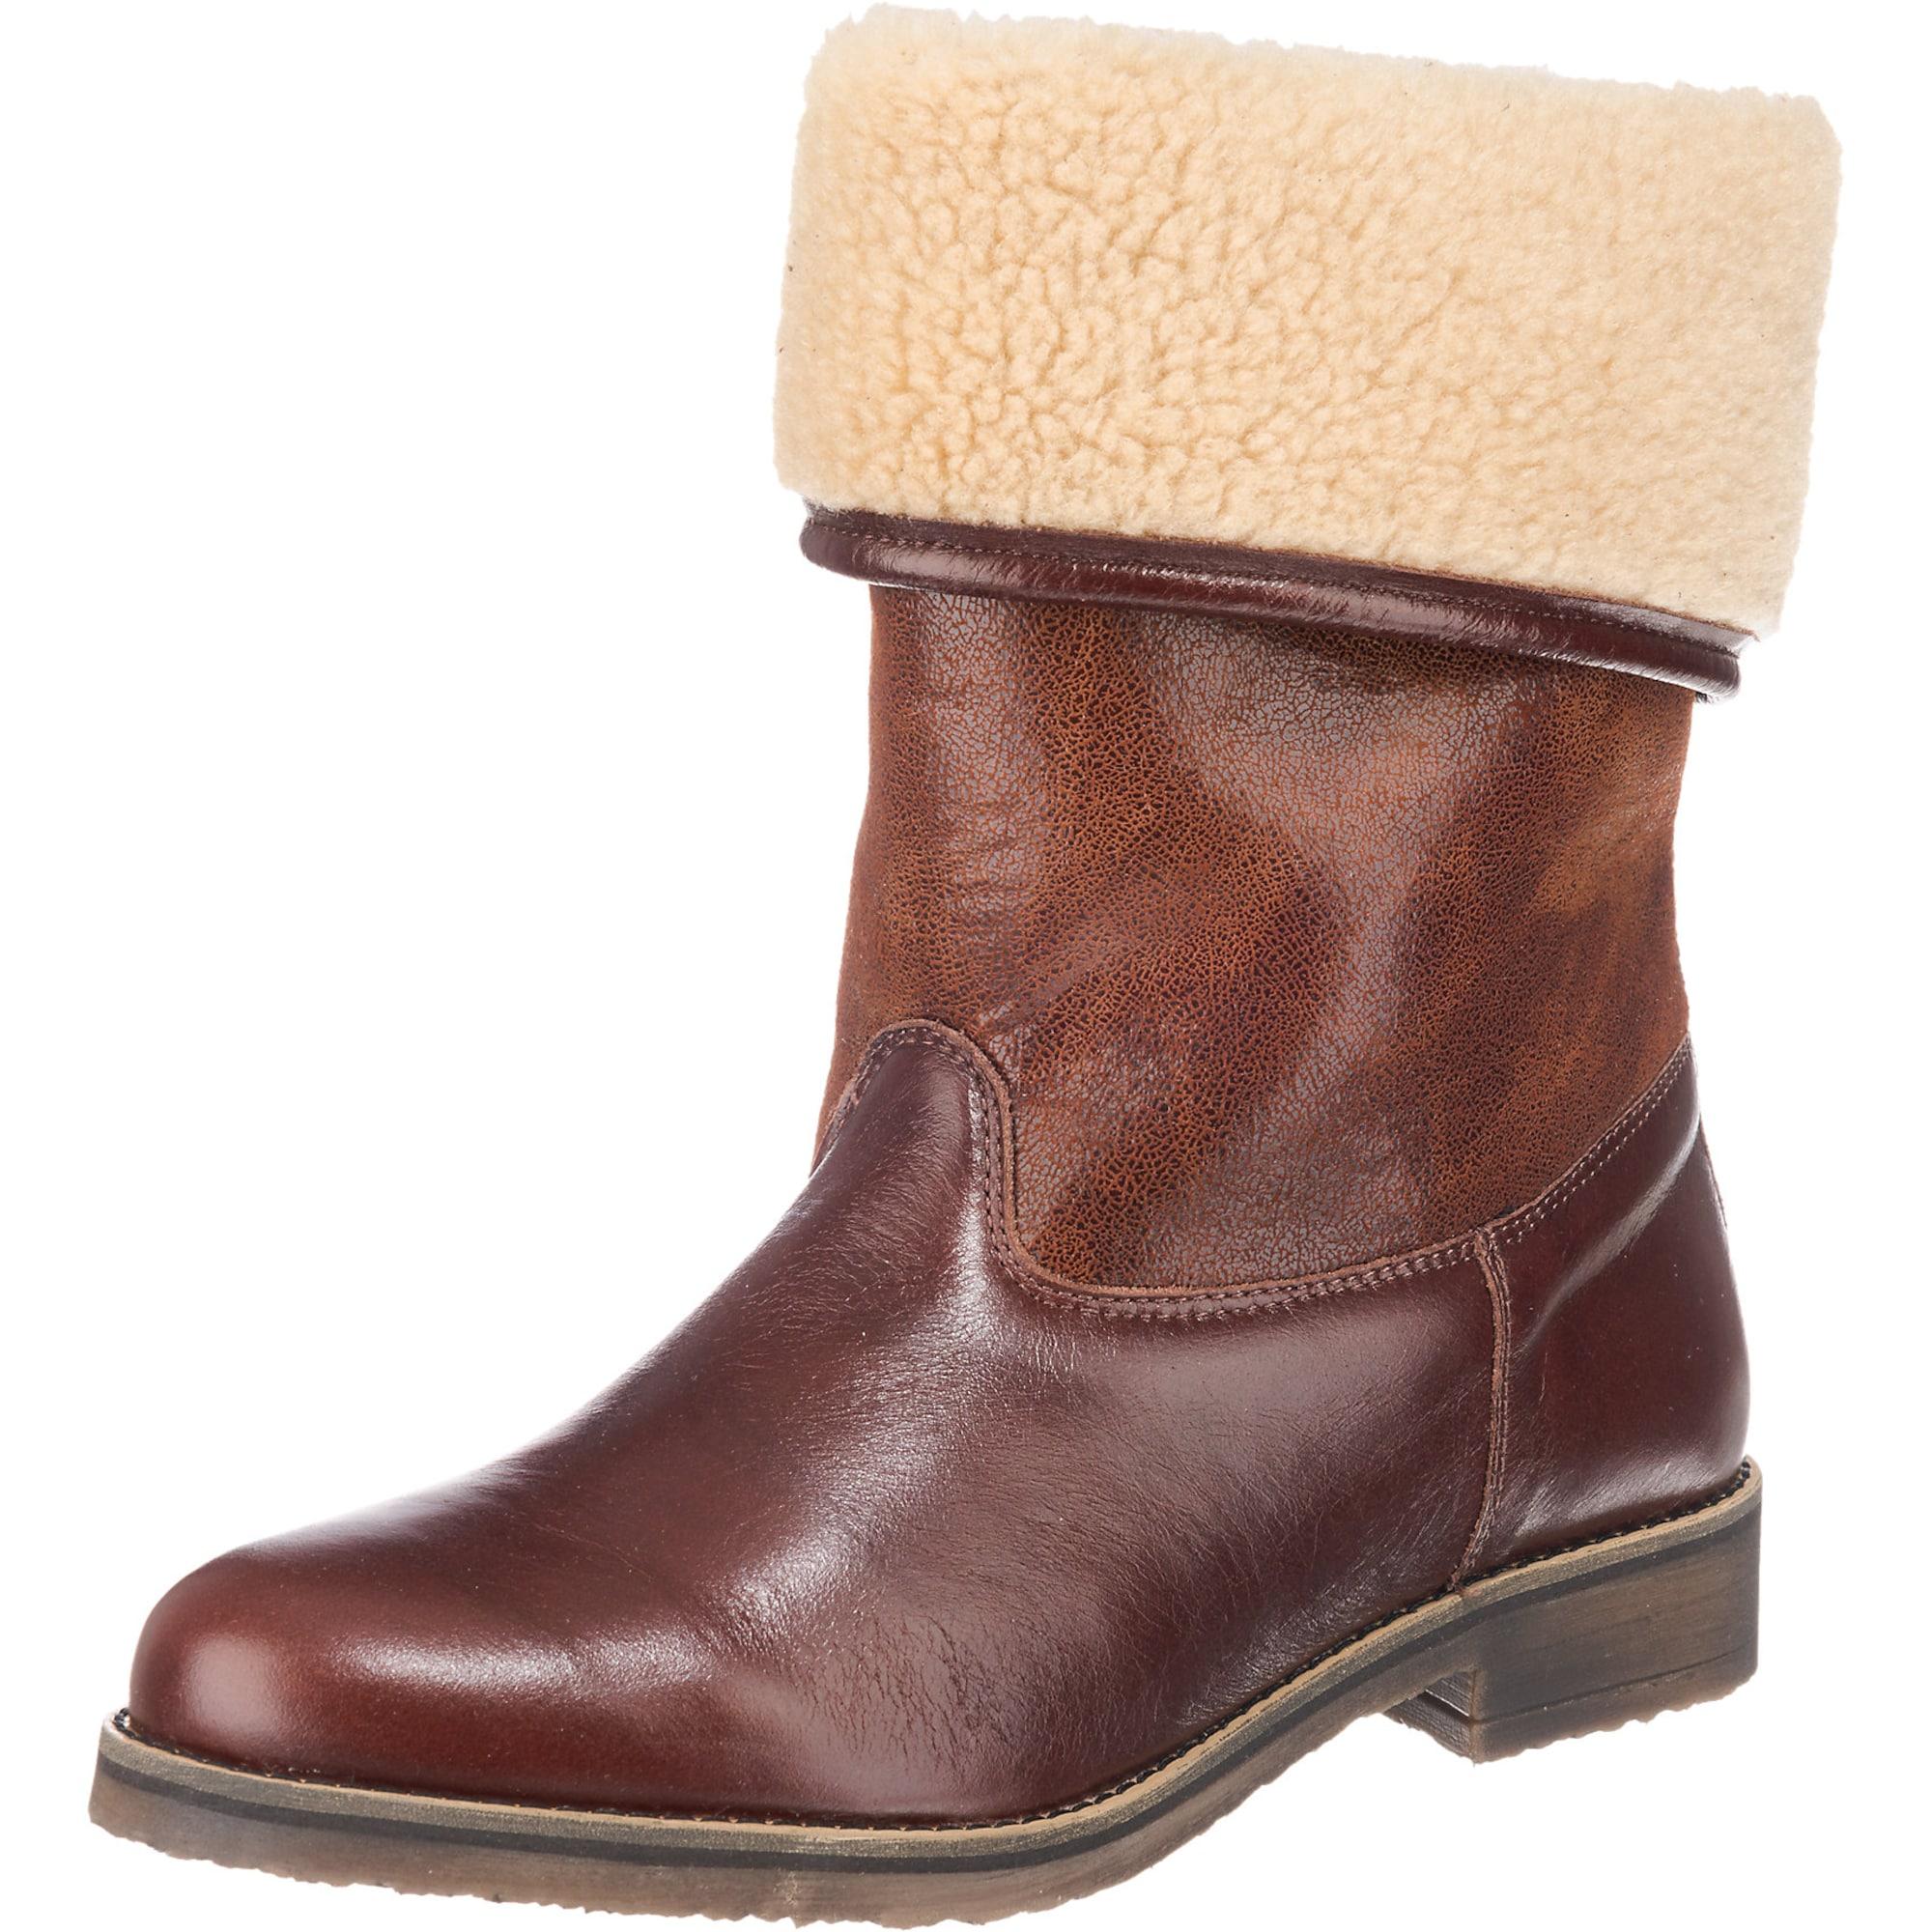 Winterstiefel   Schuhe > Stiefel > Winterstiefel   KMB